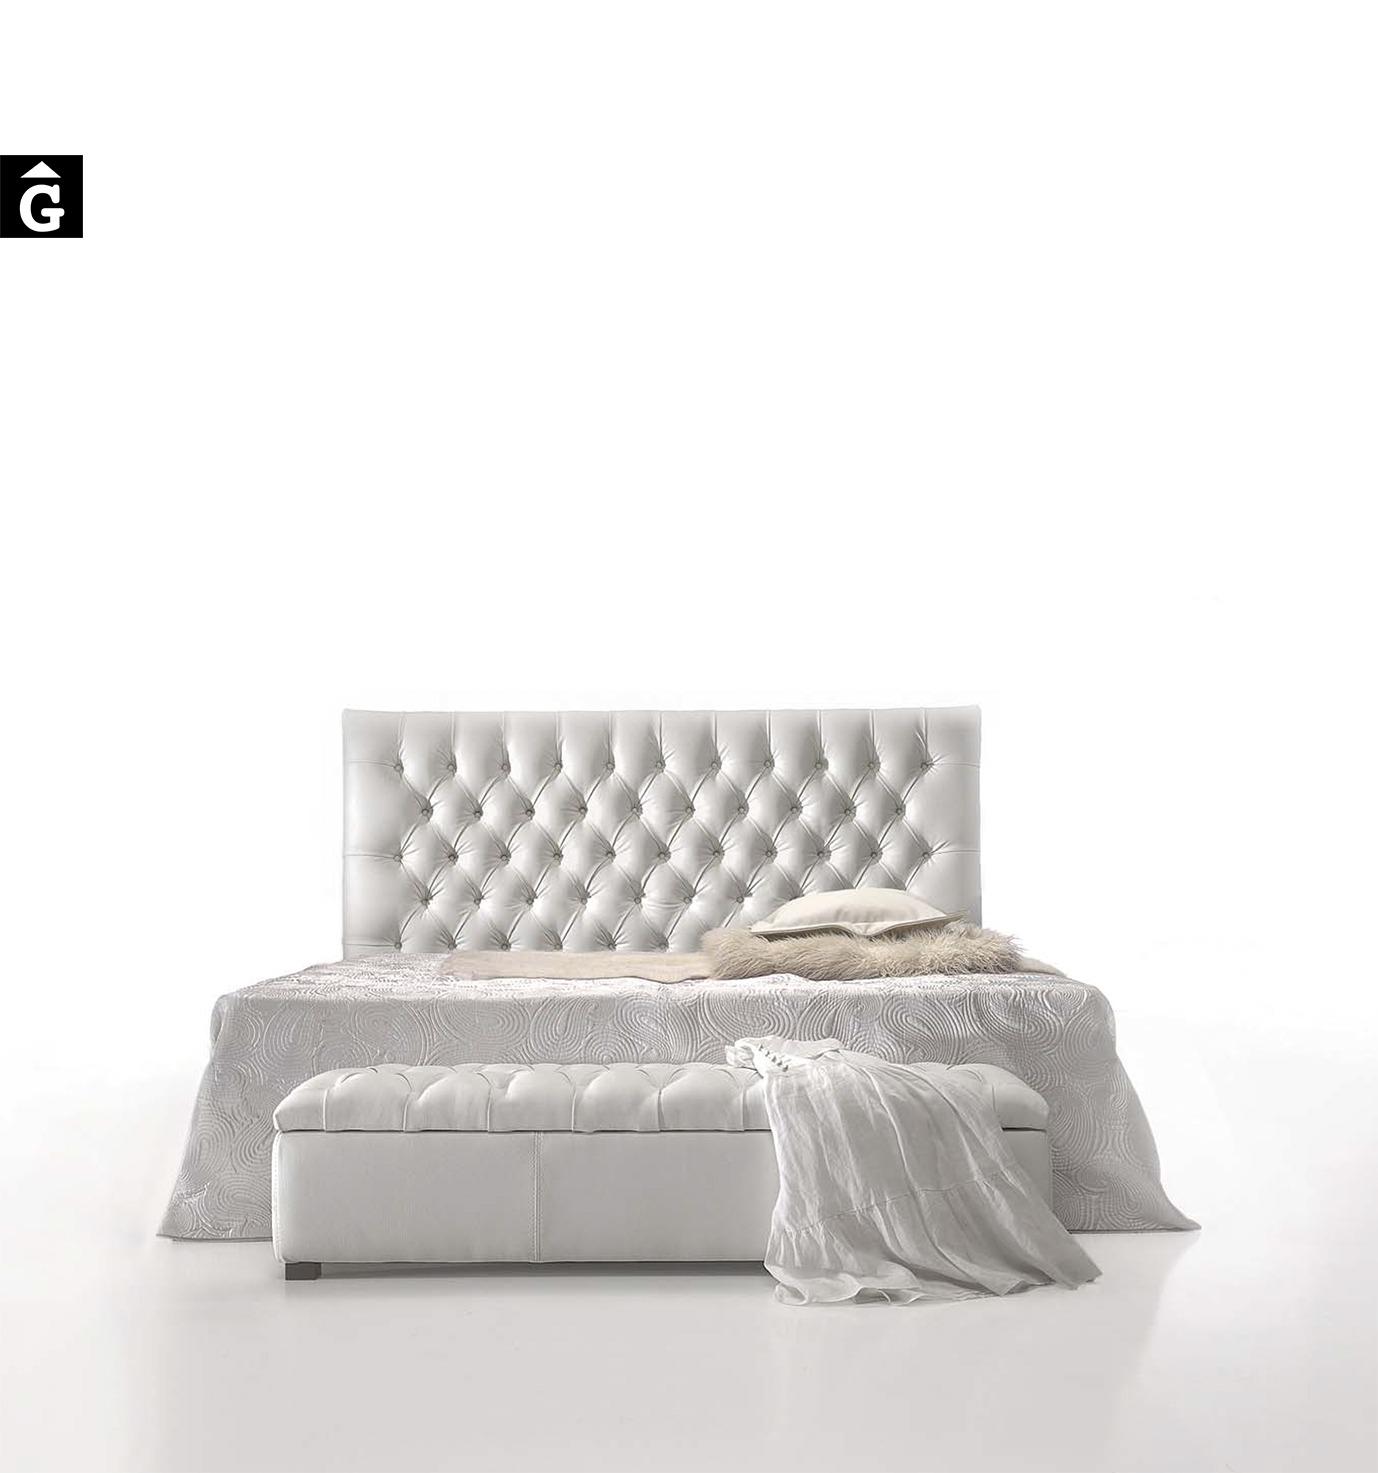 MORADILLO BY MOBLES GIFREU BEDS LLIT TAPISSAT CAPITONÉ GIRONA